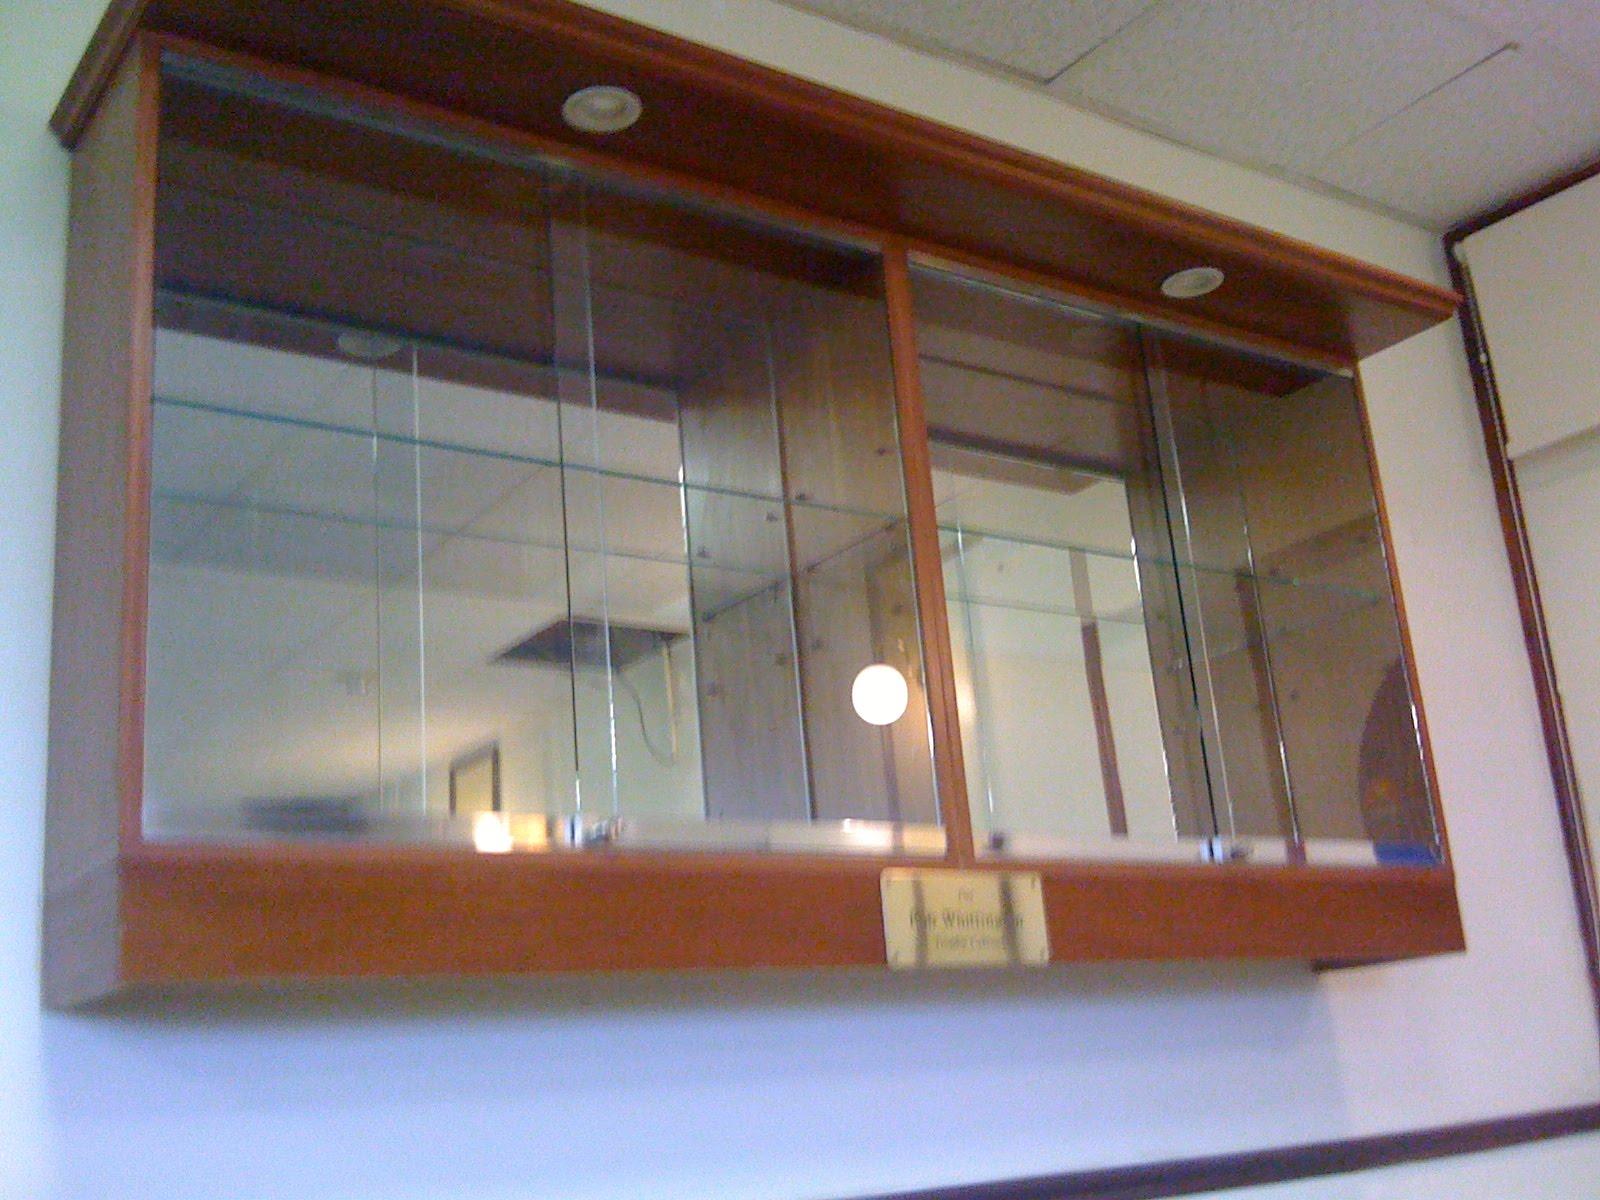 The Keynsham Town Non Trophy Cabinet